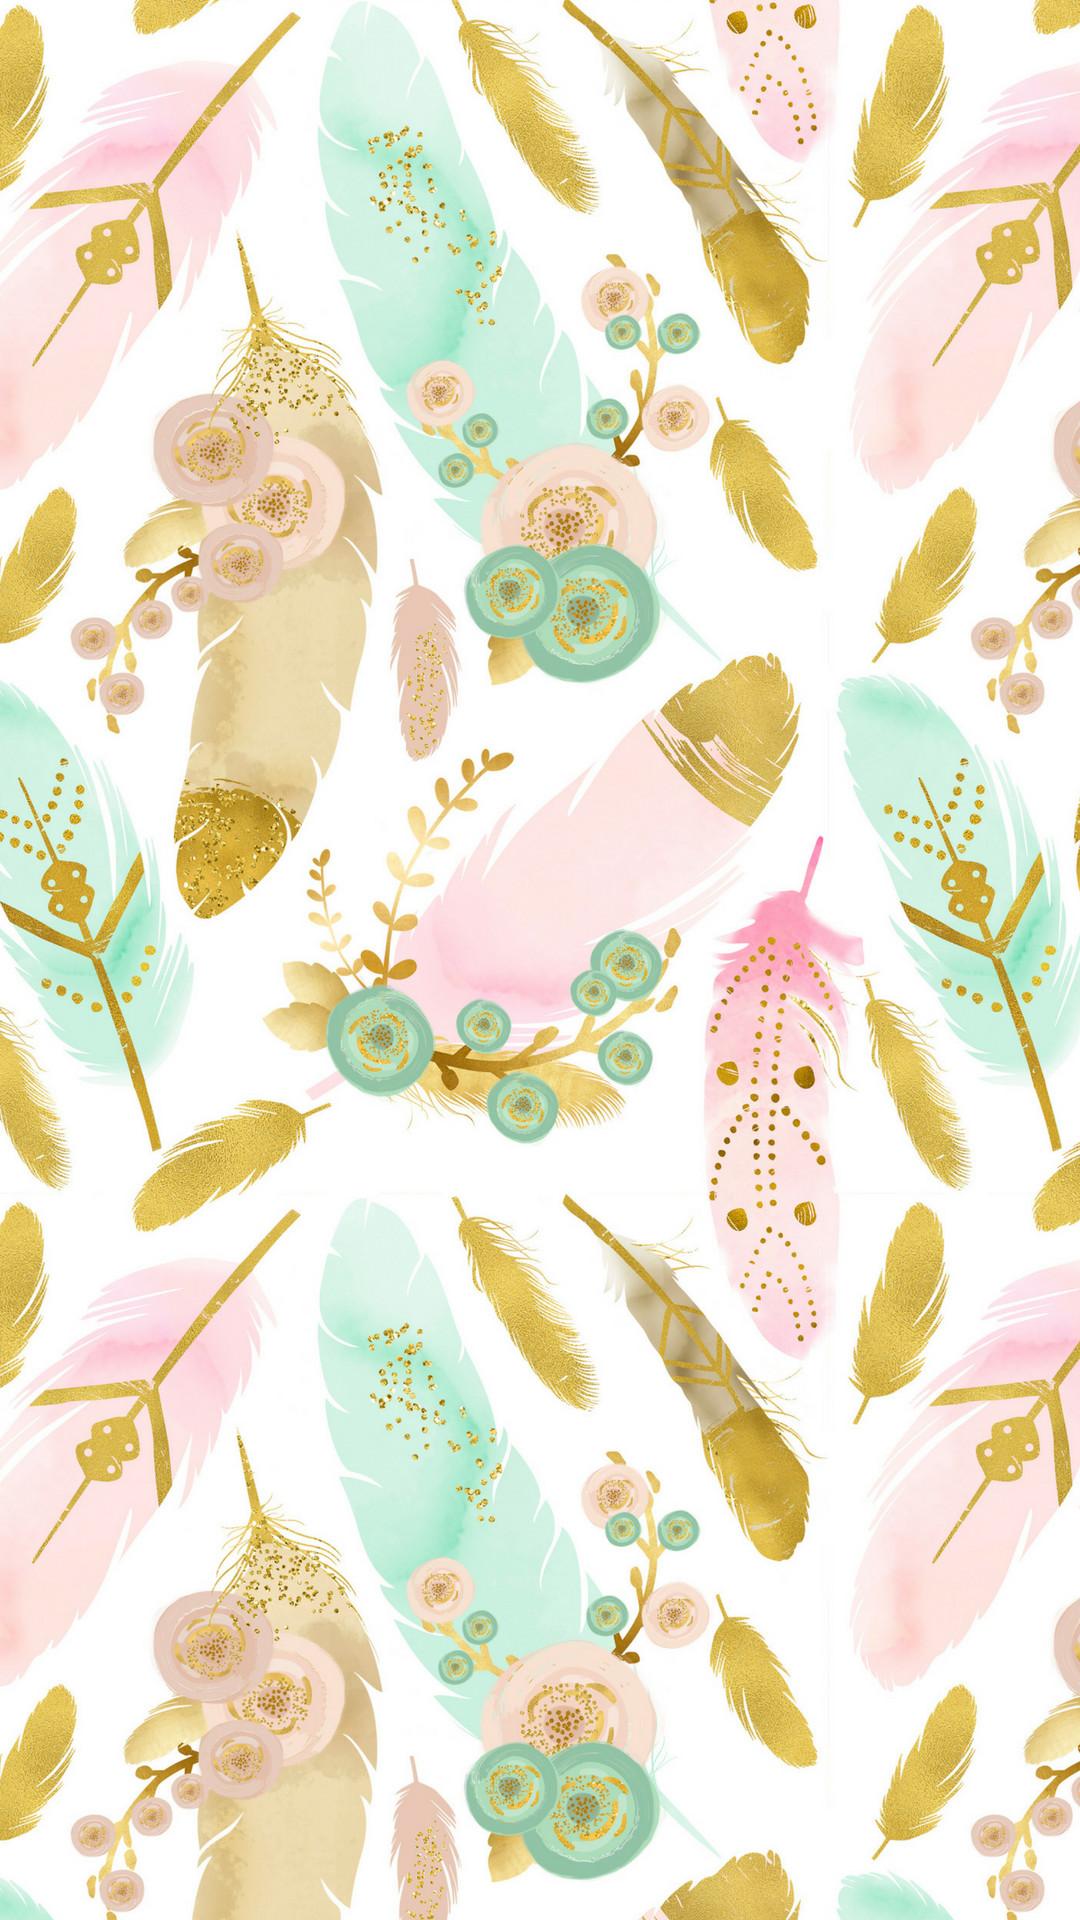 Boho Phone Wallpaper 50 Images